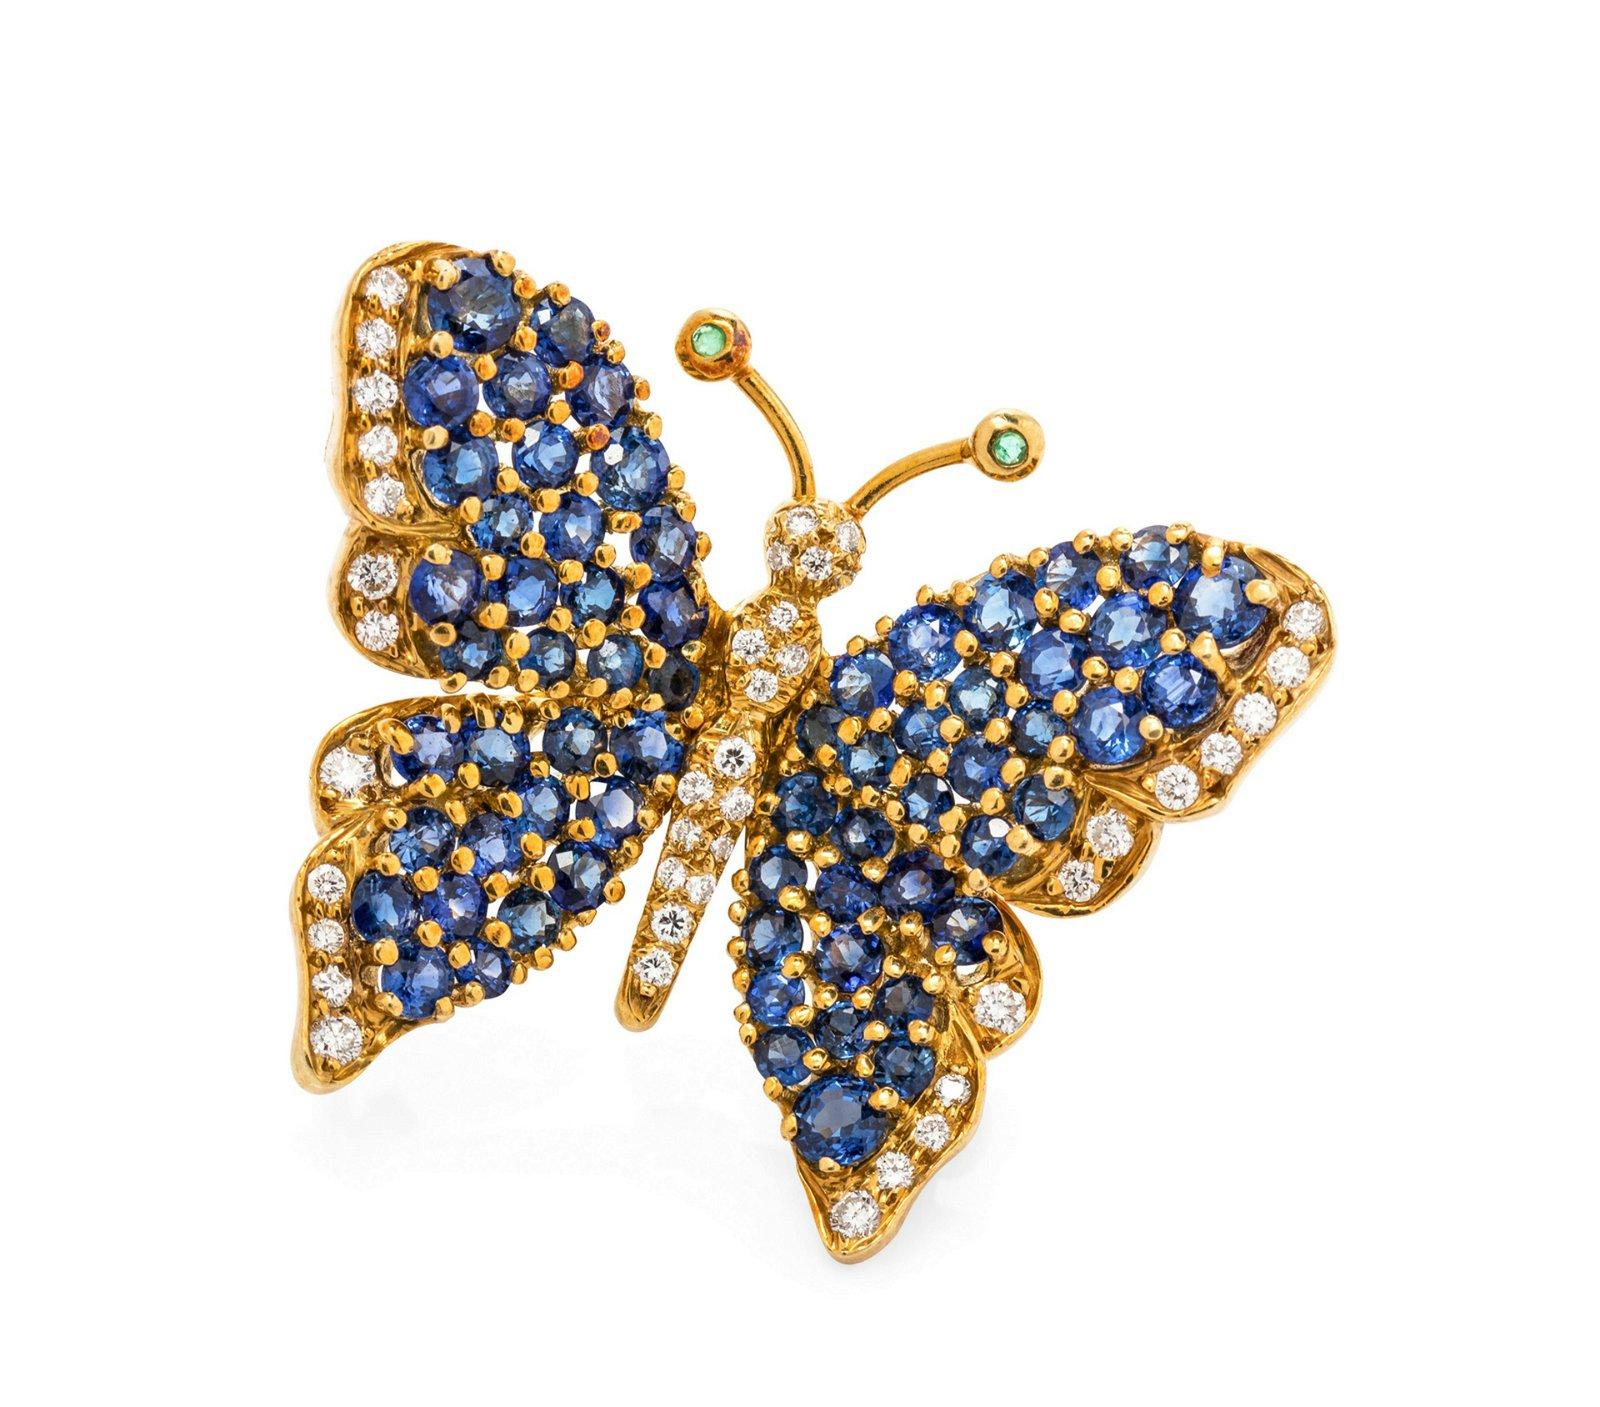 An 18 Karat Yellow Gold, Diamond, Sapphire and Emerald